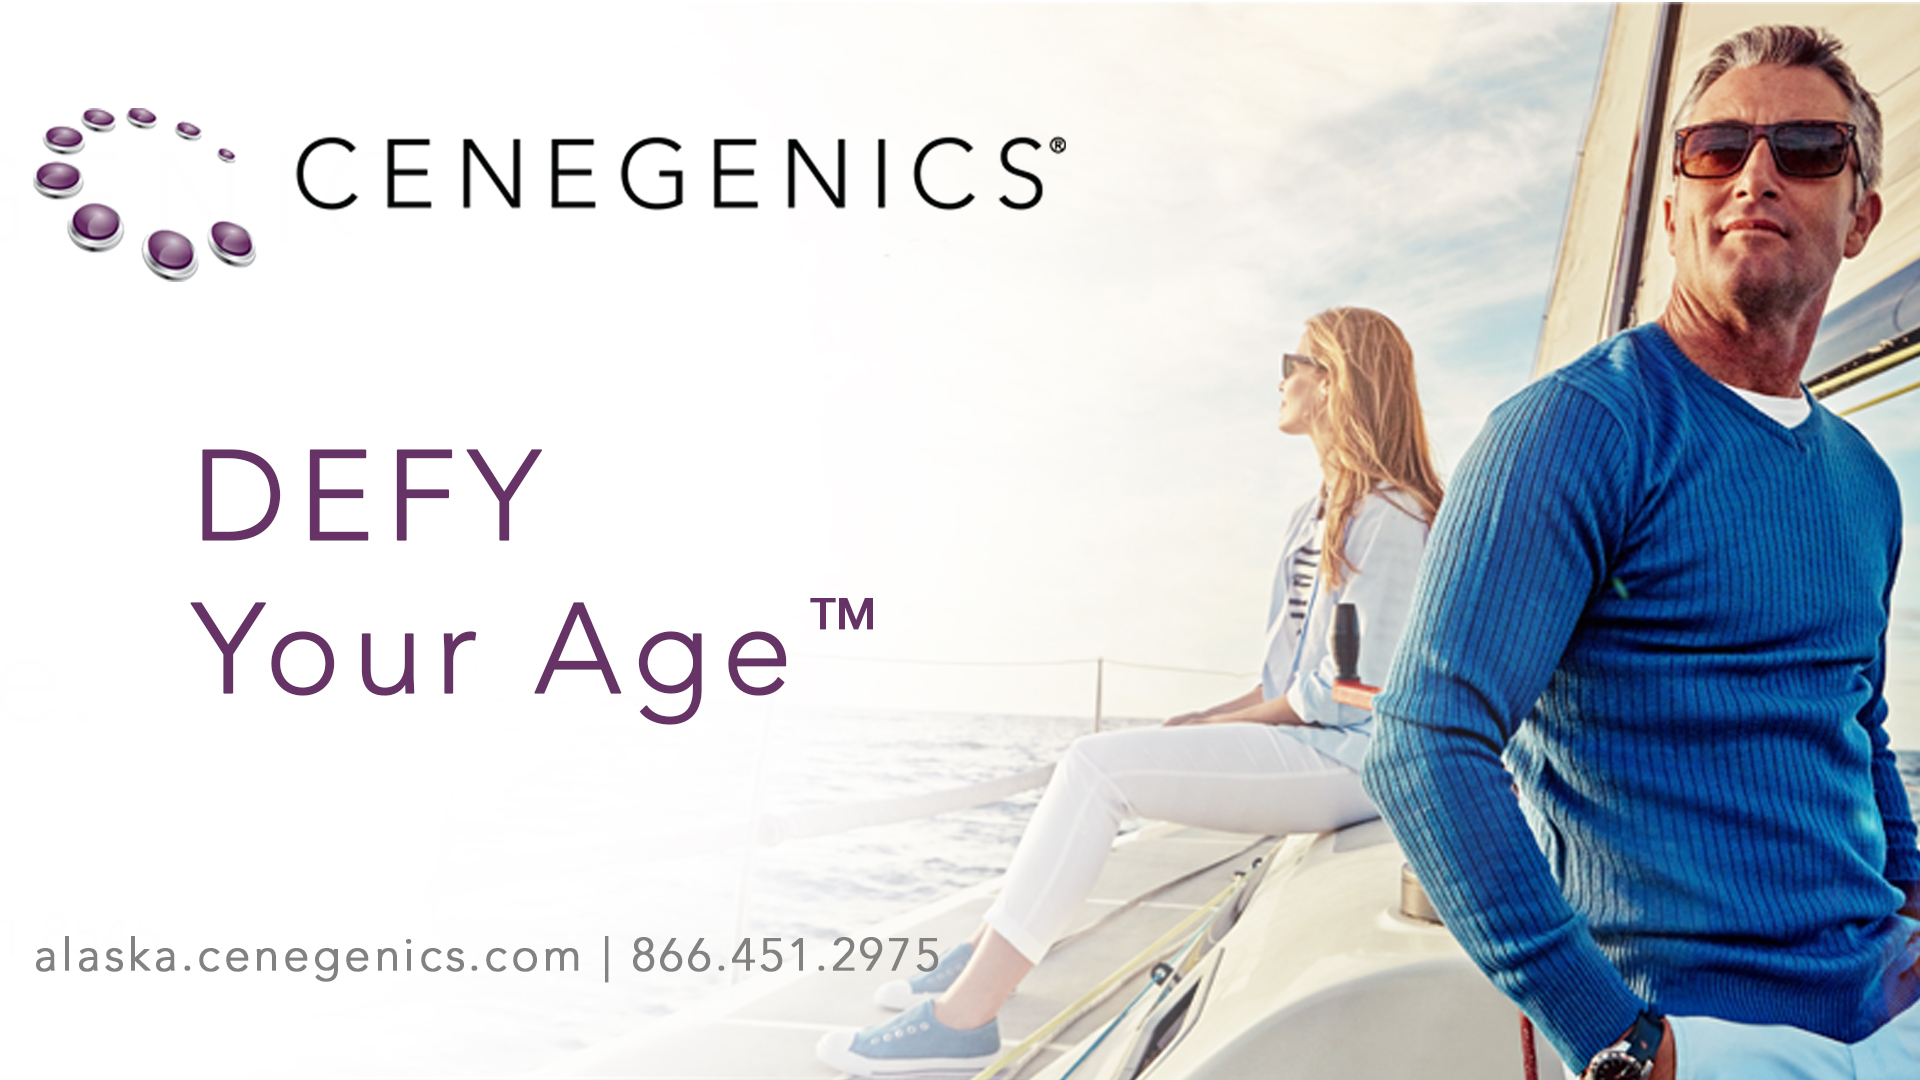 Cenegenics Alaska reviews | Medical Centers at 35785 Edgington Rd - Soldotna AK